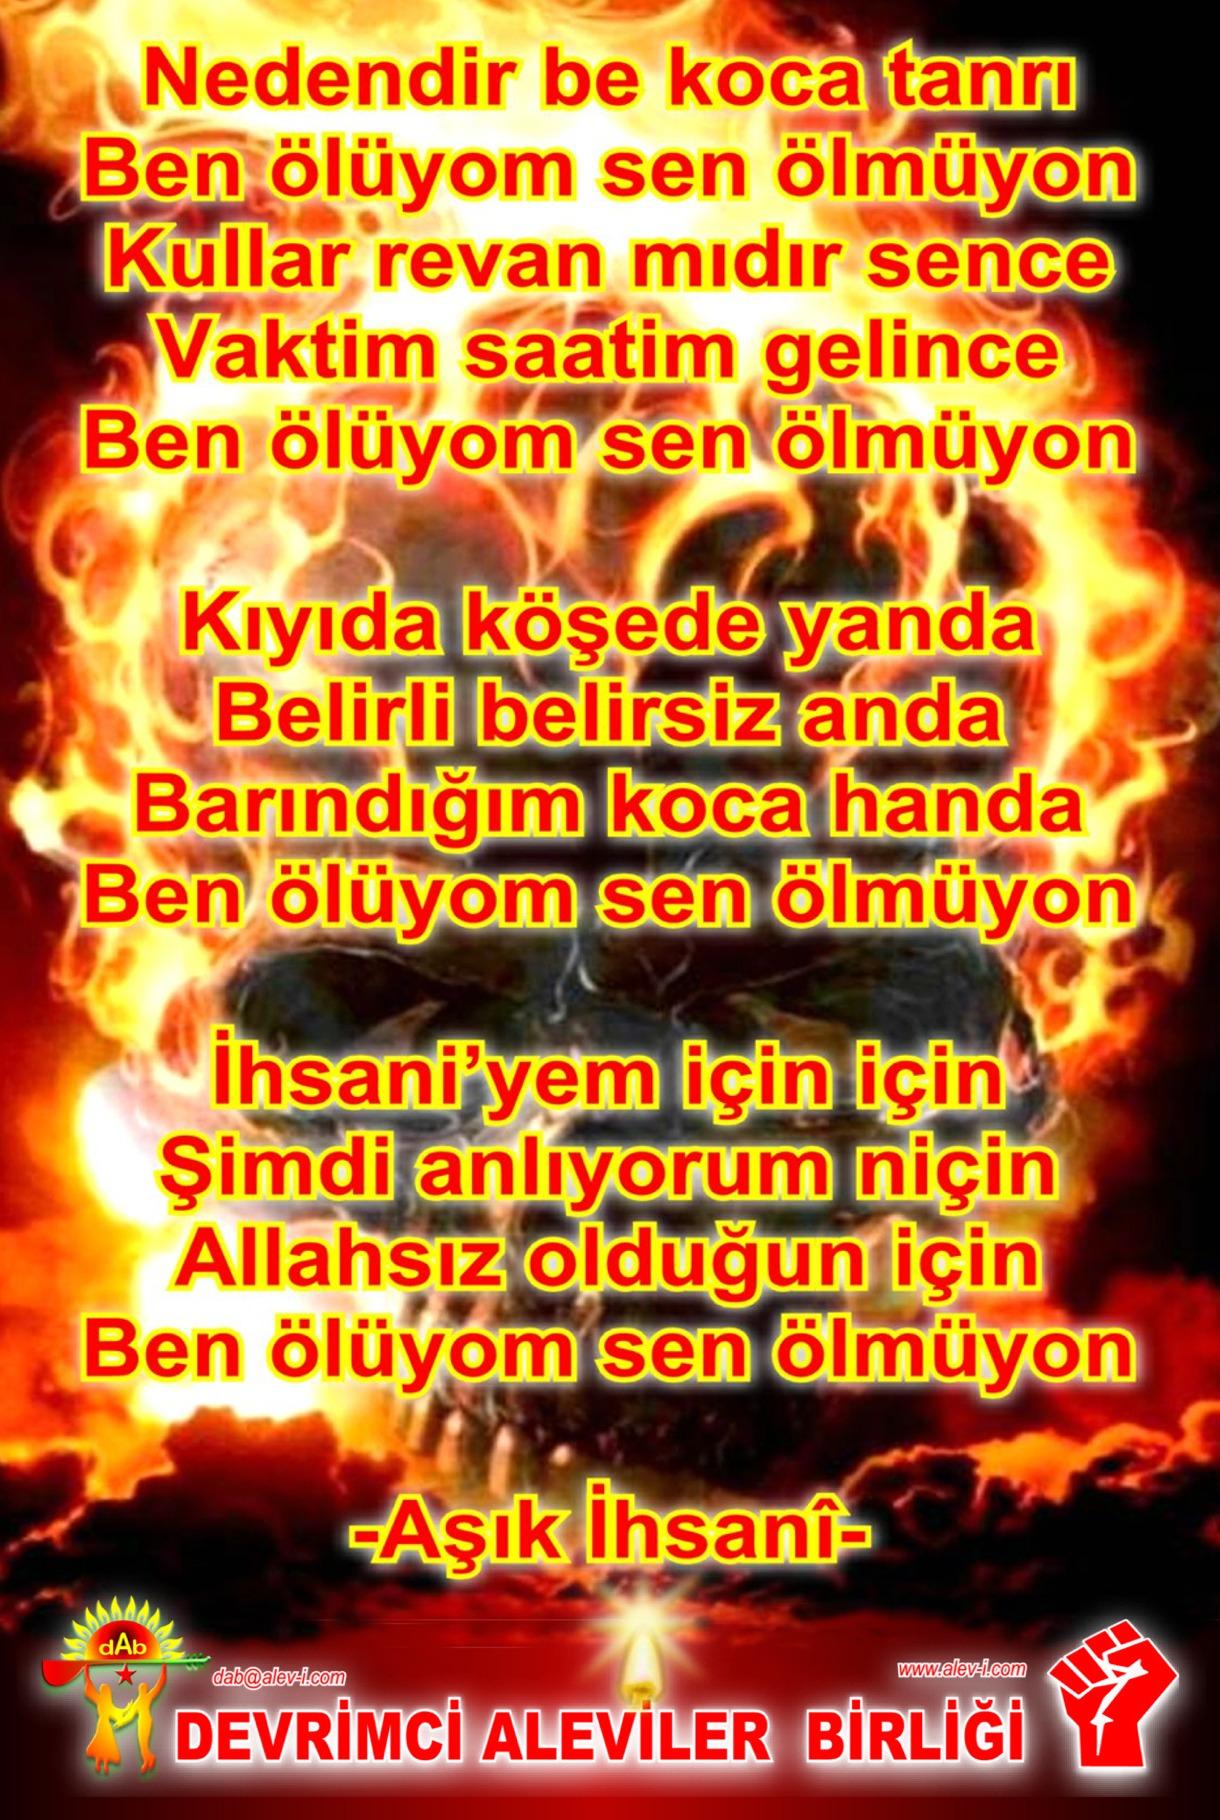 Alevi Bektaşi Kızılbaş Pir Sultan Devrimci Aleviler Birliği DAB sen olmuyon